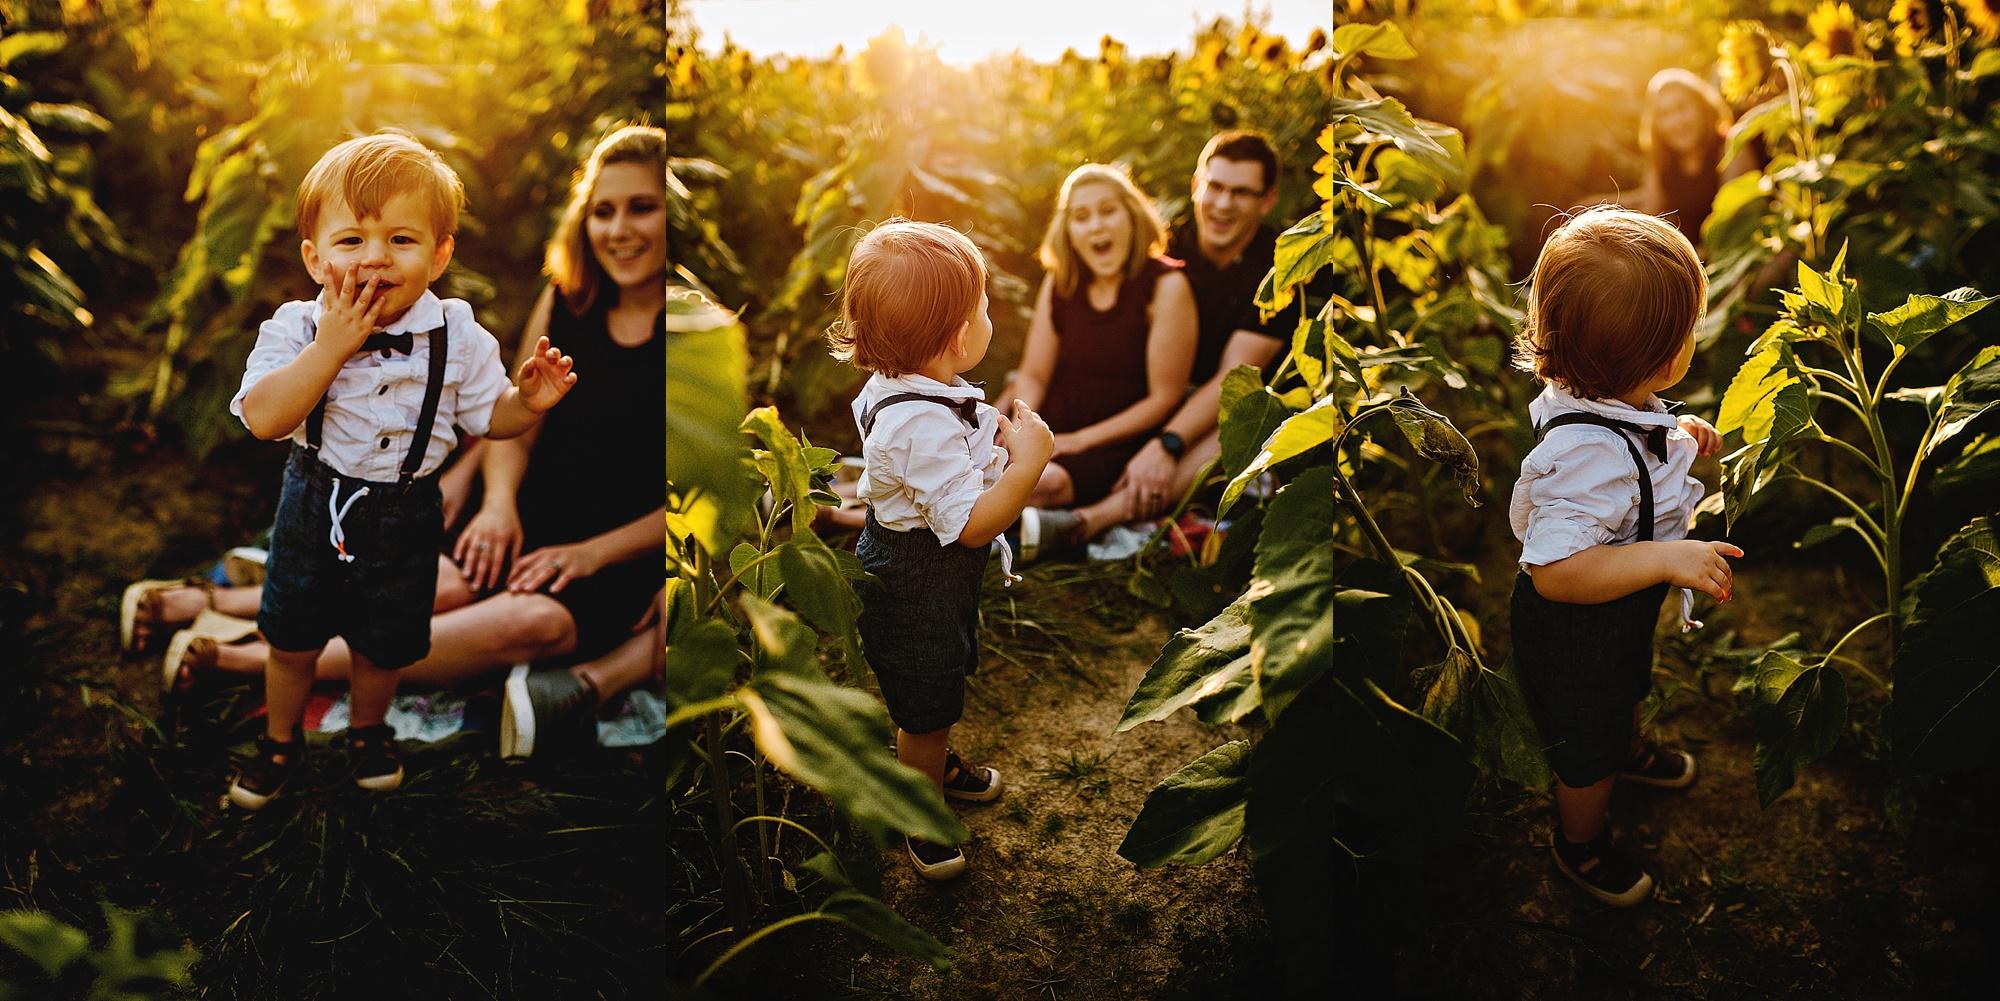 Schreiner-family-lauren-grayson-cleveland-photographer-sunflower-field-session_0016.jpg